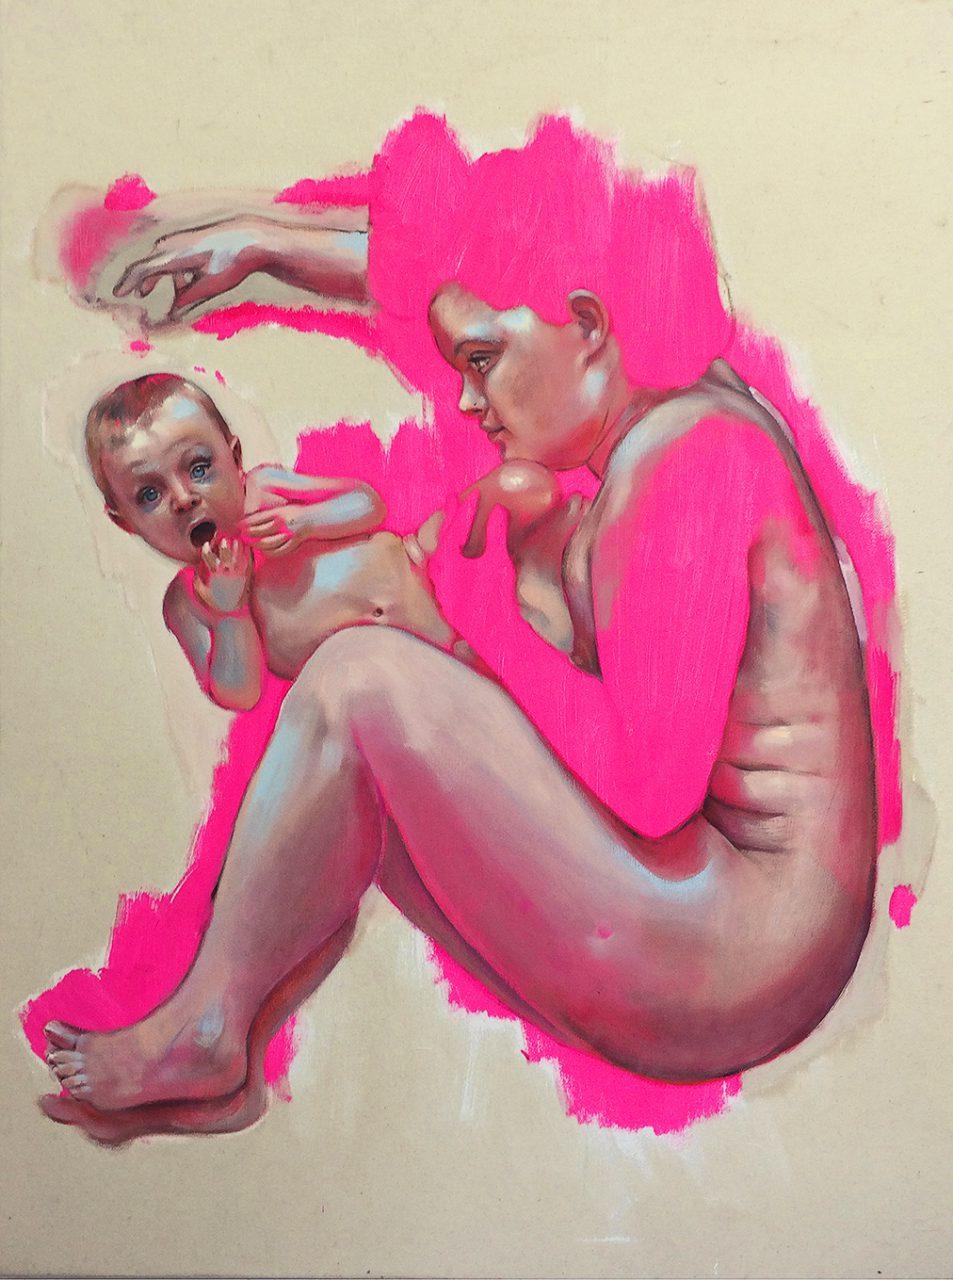 fluorescent pink ––– 120x90cm ––– 2016 ––– oil-acryl on linen/Öl-Acryl auf Leinen